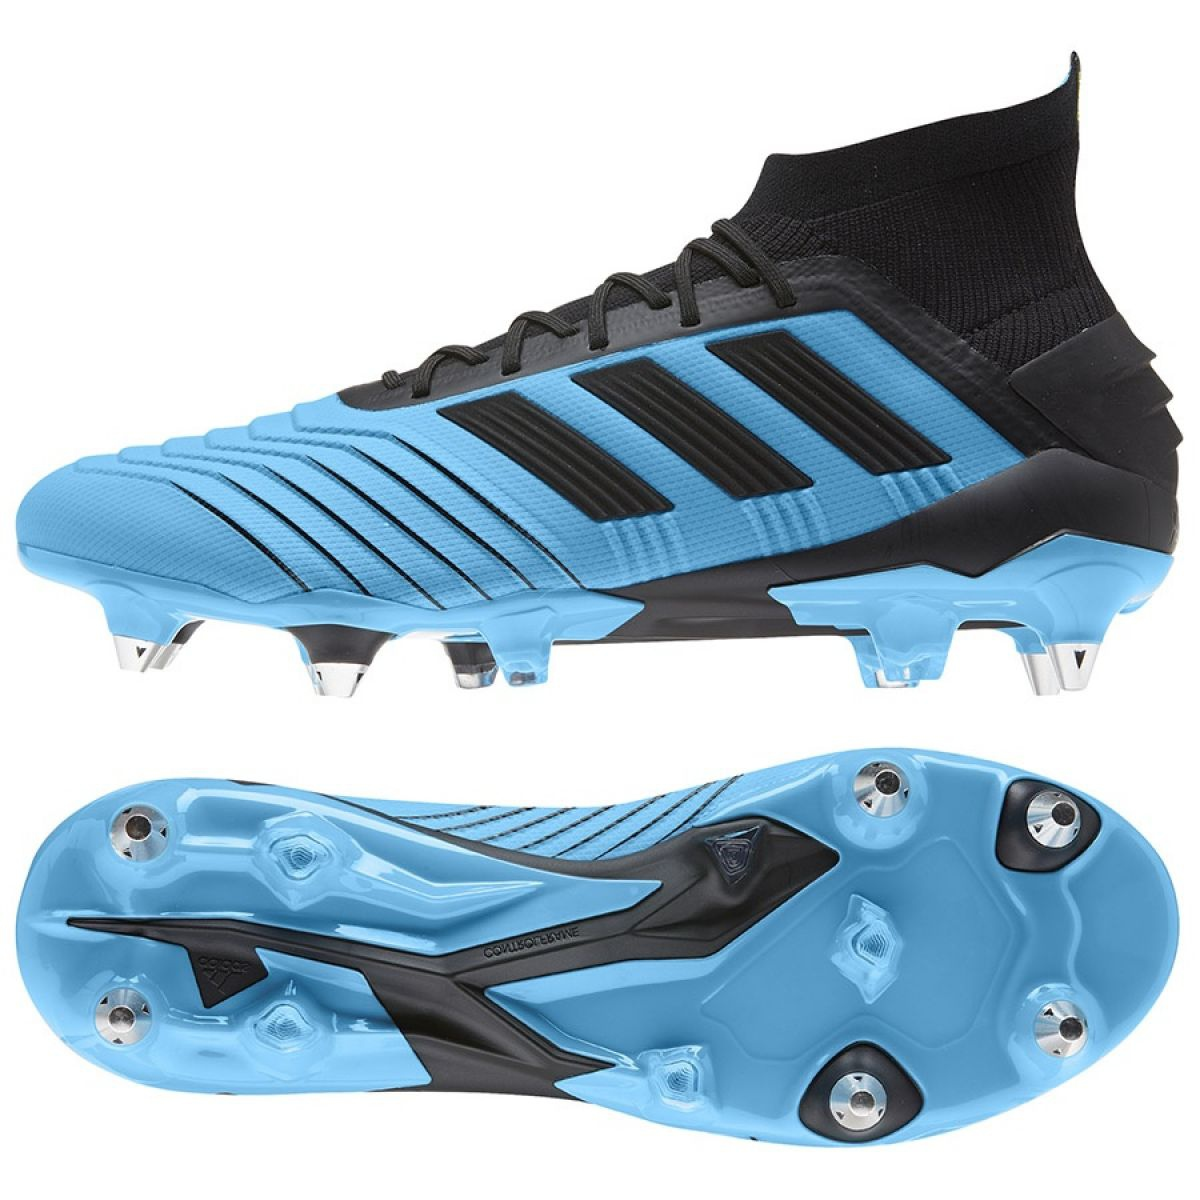 Fussballschuhe Adidas Predator 19 1 Sg M F99988 Blau Blau